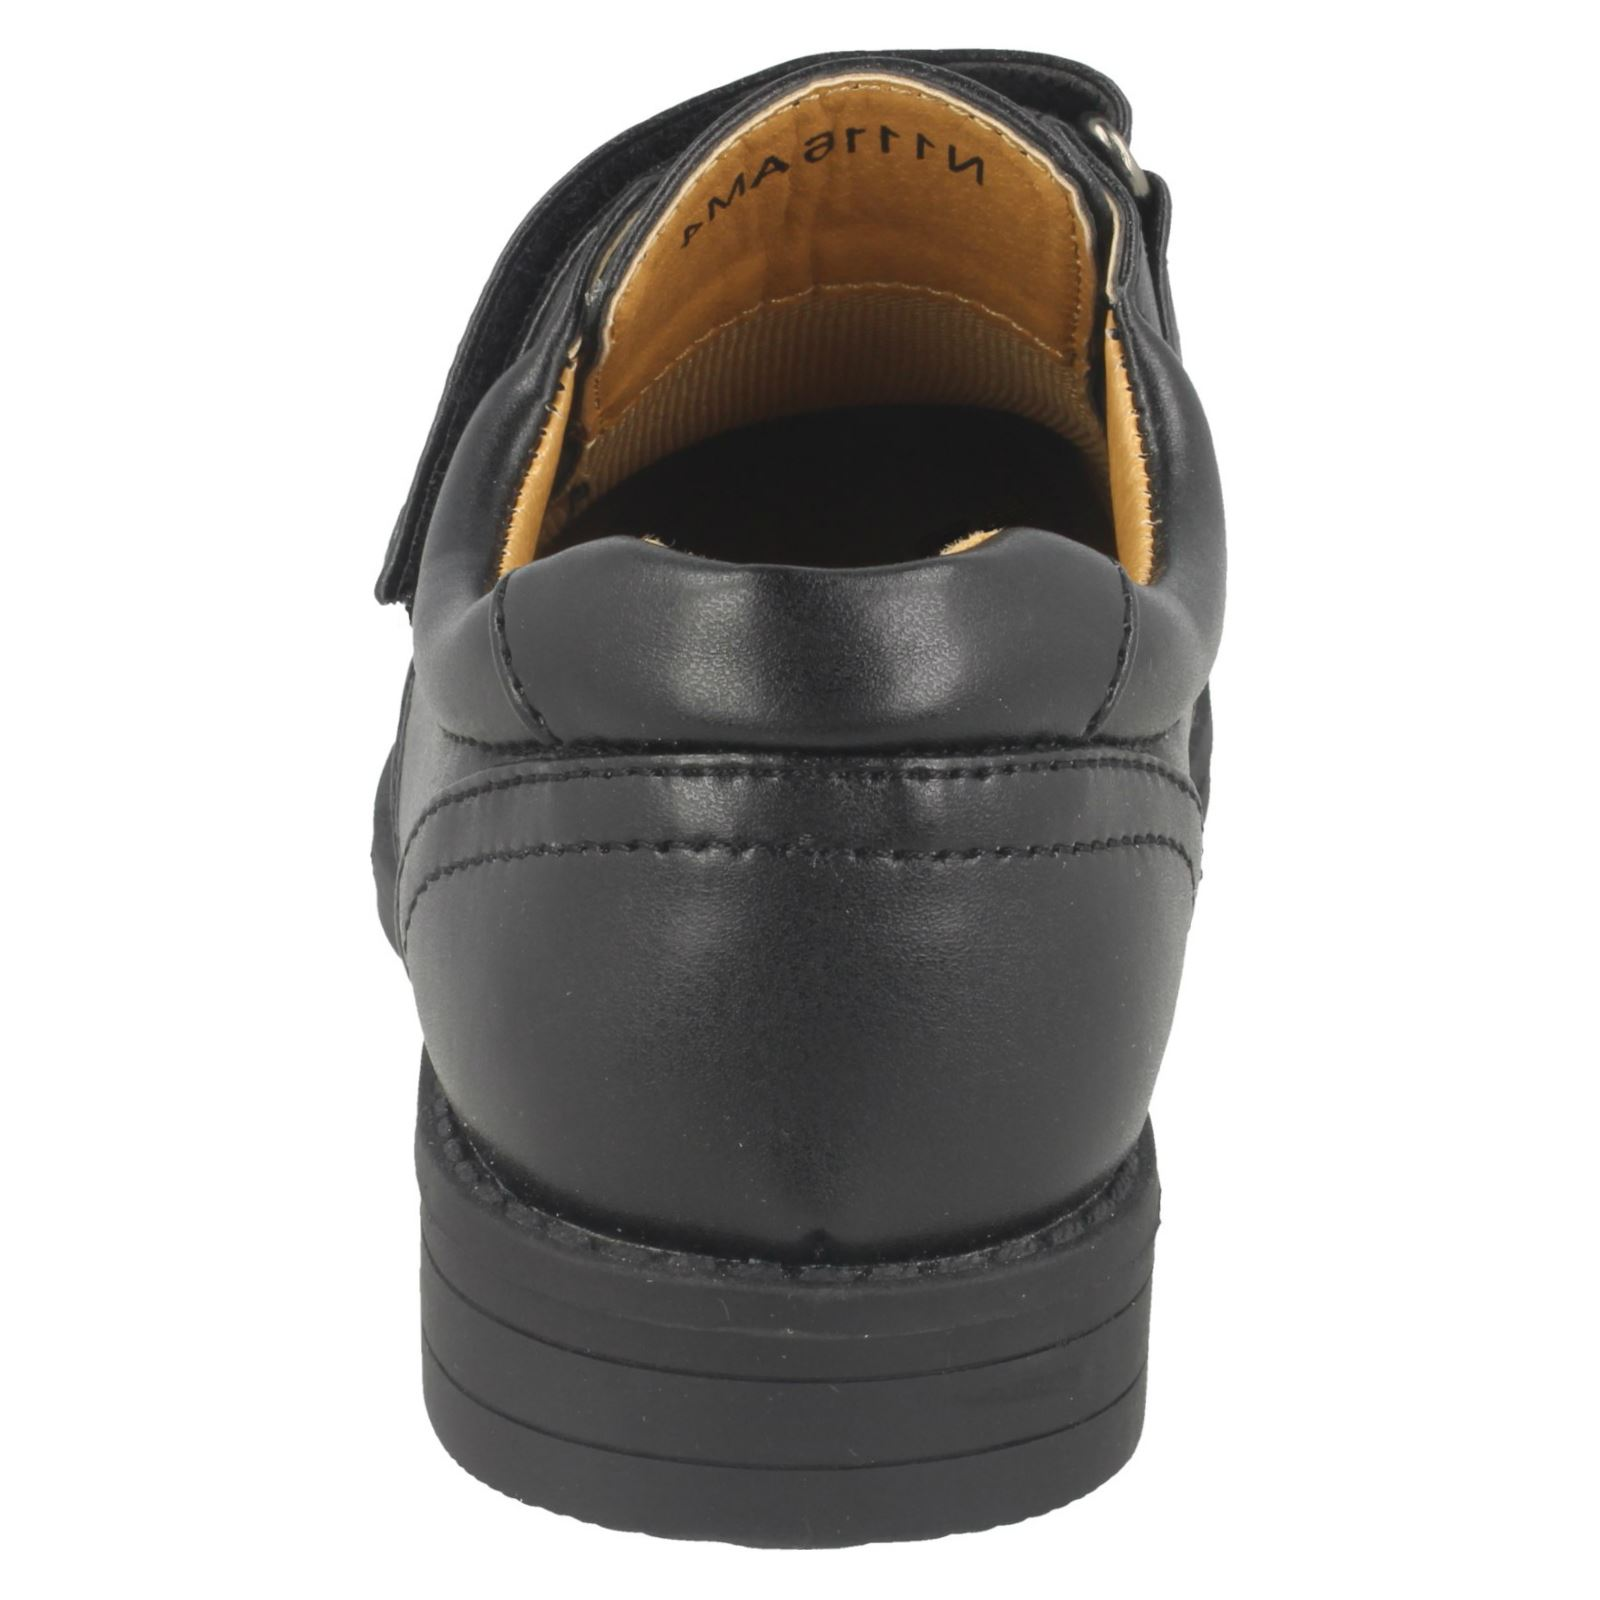 Chicos fresco para la escuela N1116 Smart Shoes Etiqueta ~ K